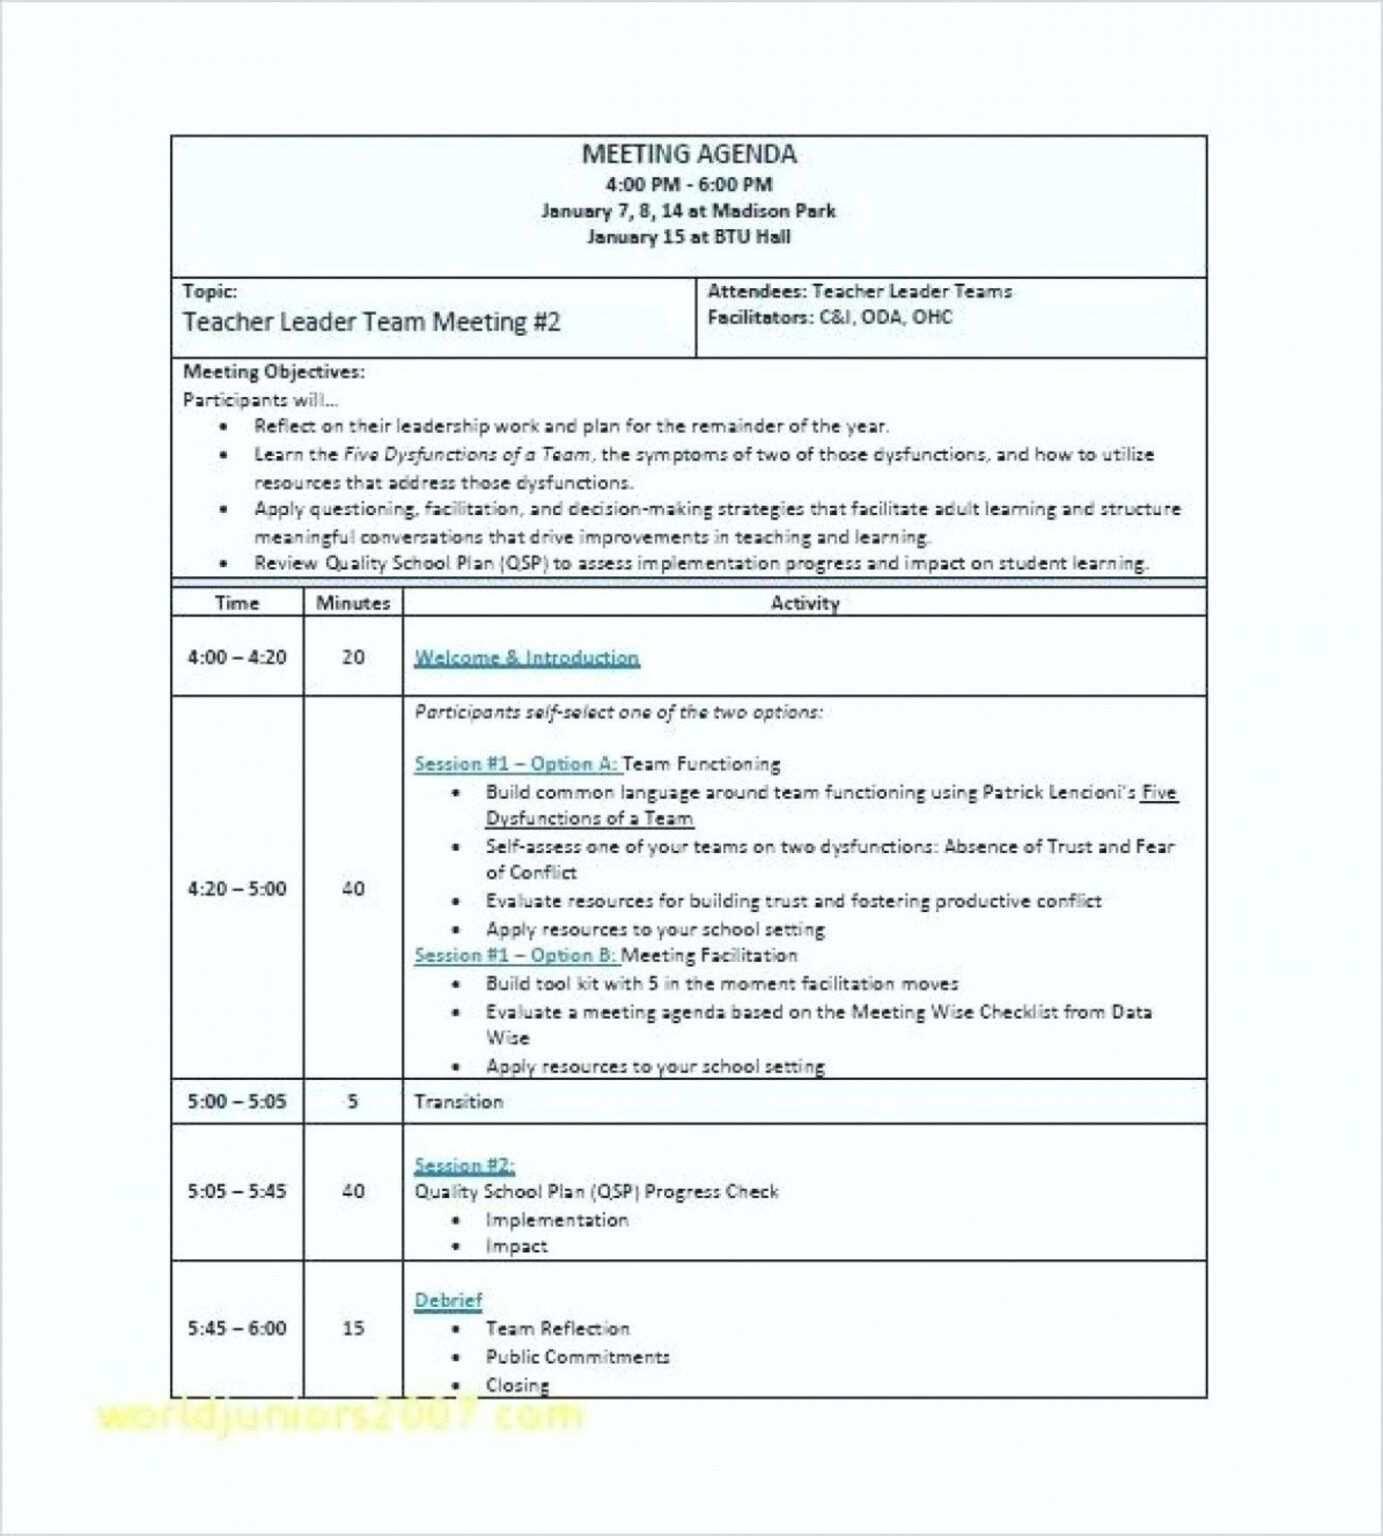 12 13 Word Agenda Vorlage Fur Meetings Ithacar Within Free Meeting Agenda Templates For Word Meeting Notes Template Meeting Agenda Template Meeting Agenda